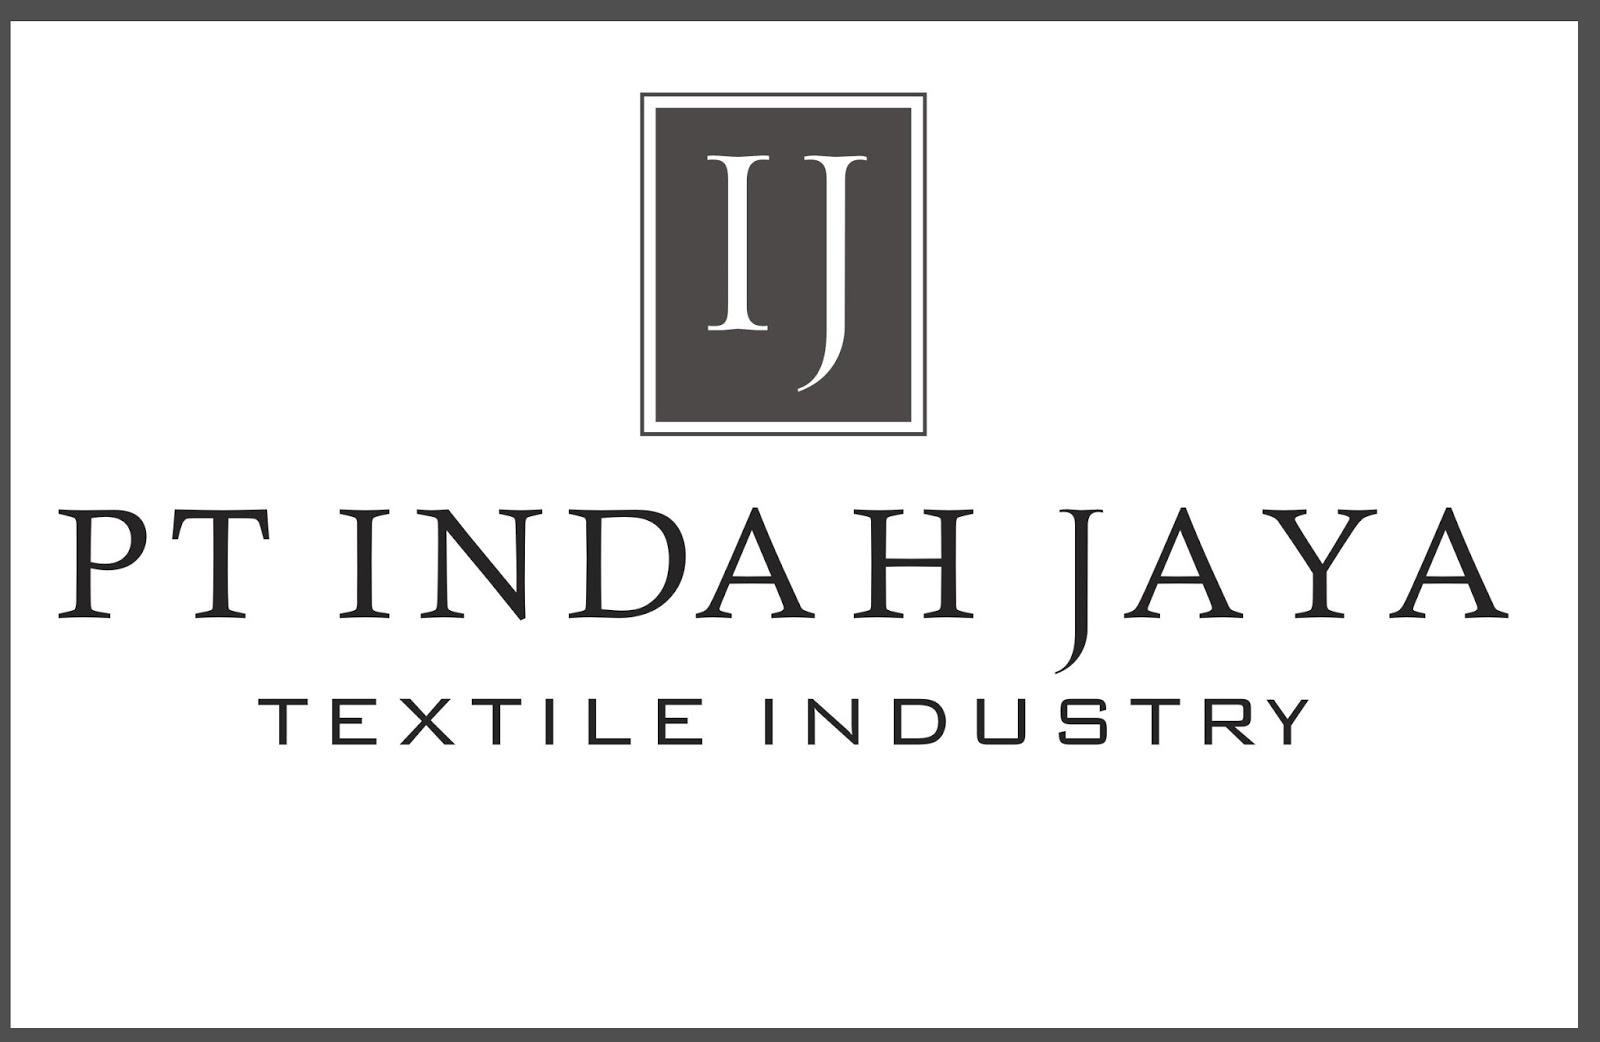 Loker Terbaru Lulusan SMK Daerah Tangerang PT Indah Jaya Textile Industry